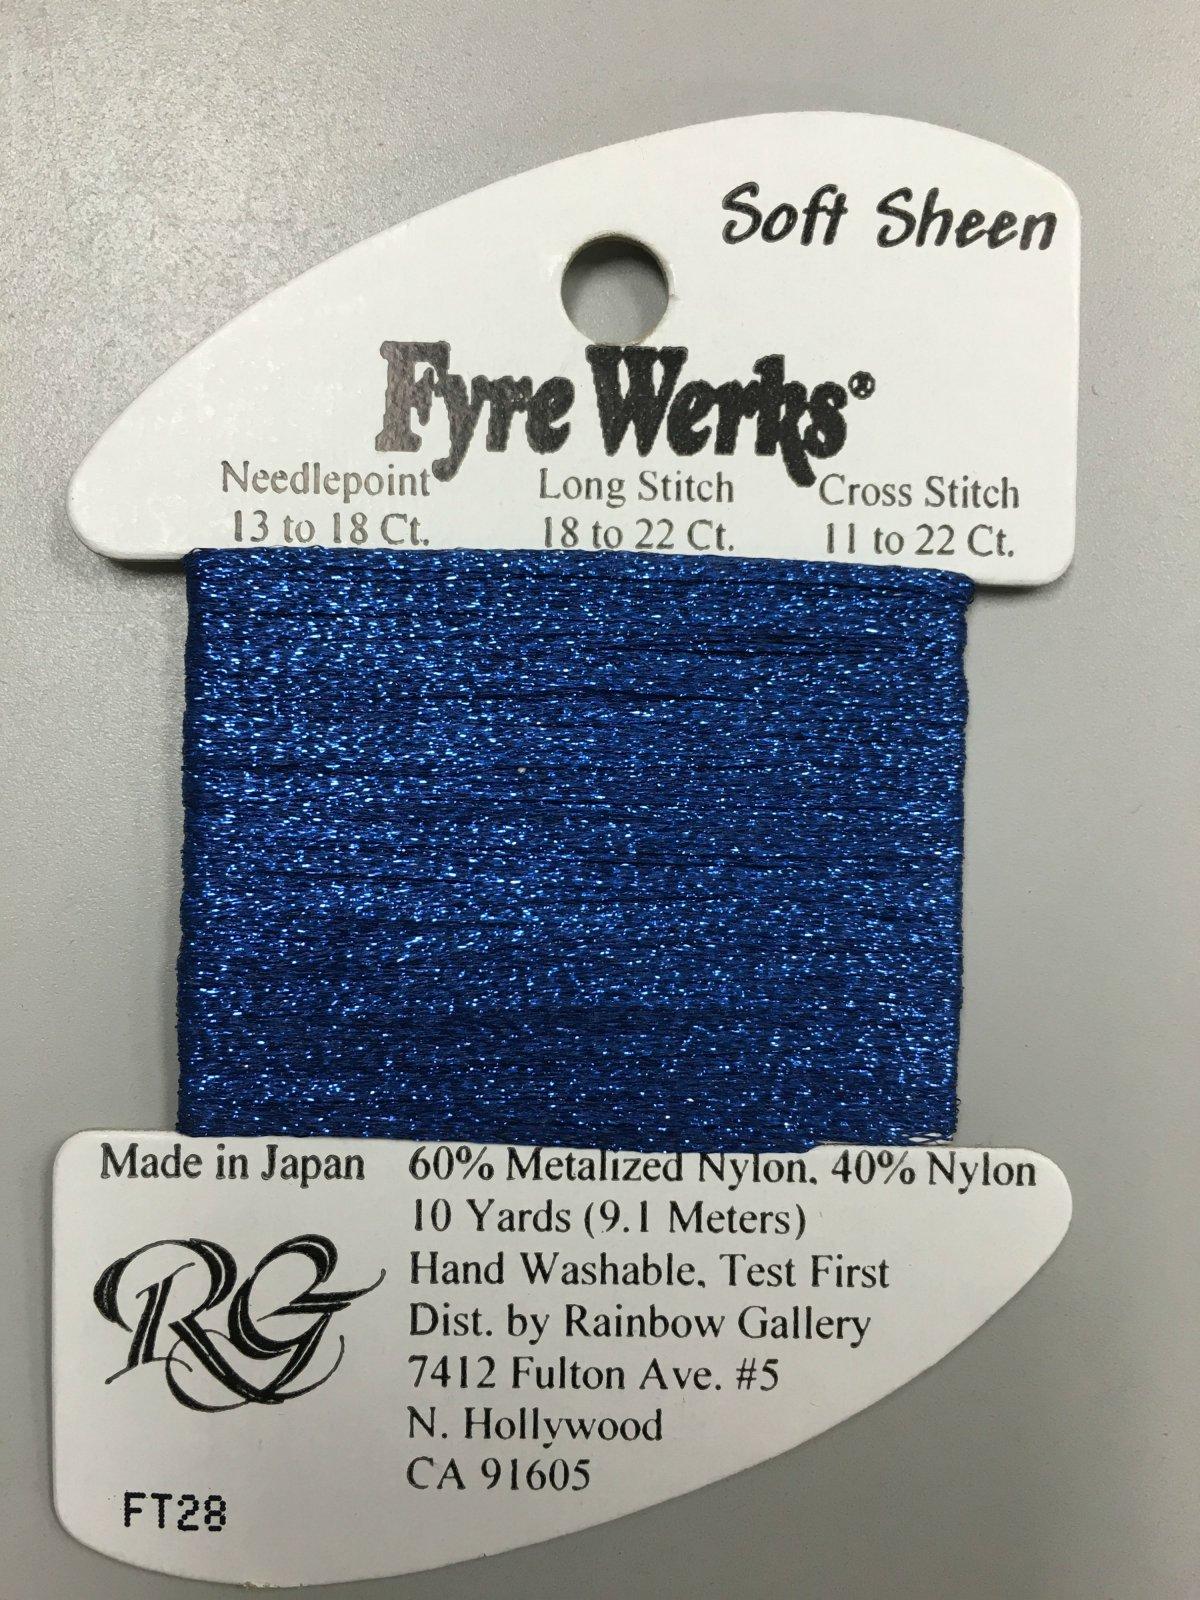 Fyre Werks Soft Sheen FT28